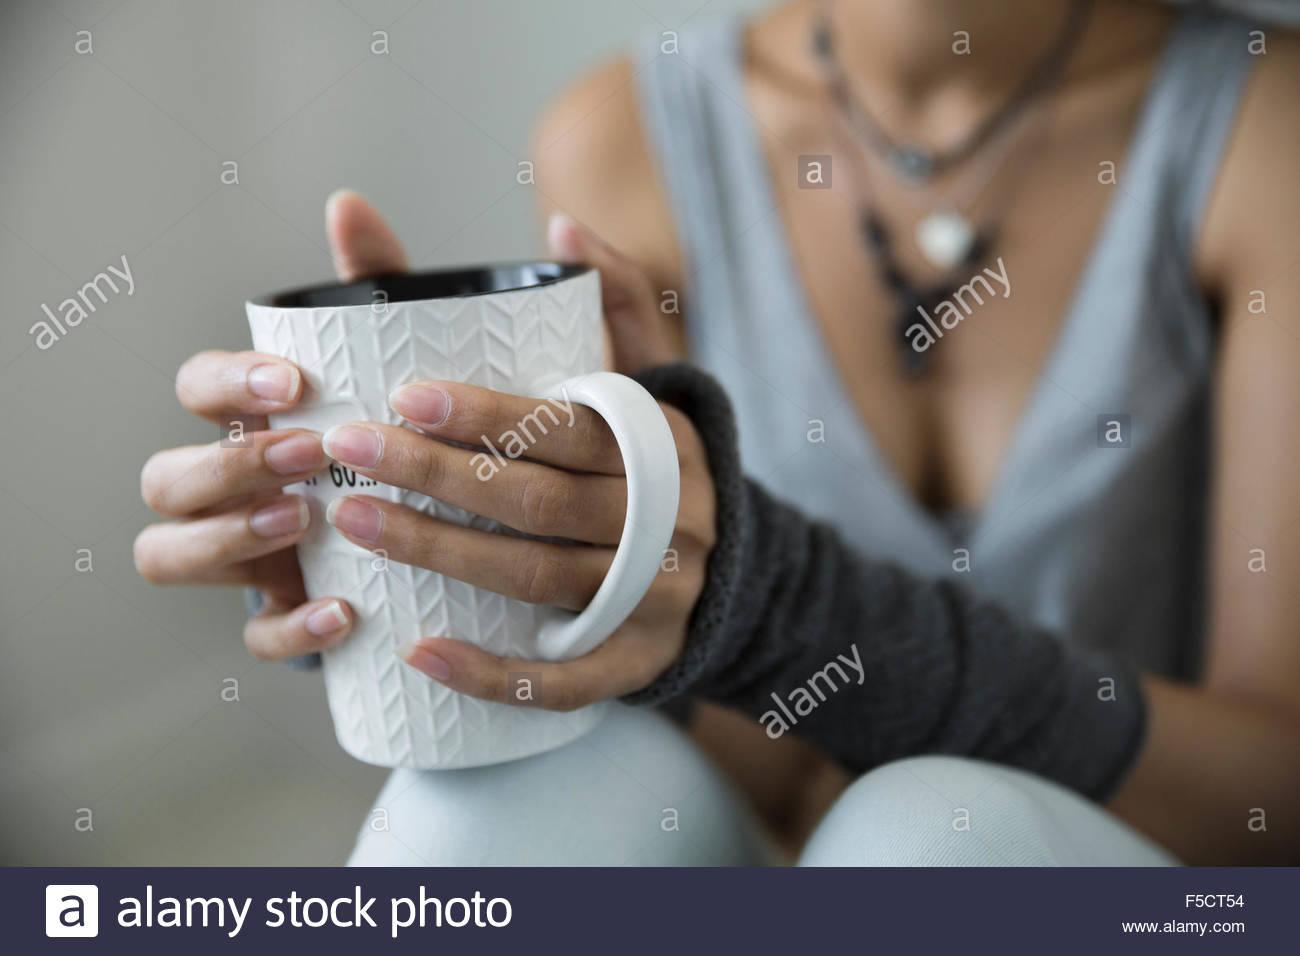 Cerrar joven bebiendo café calentadores de muñeca Imagen De Stock